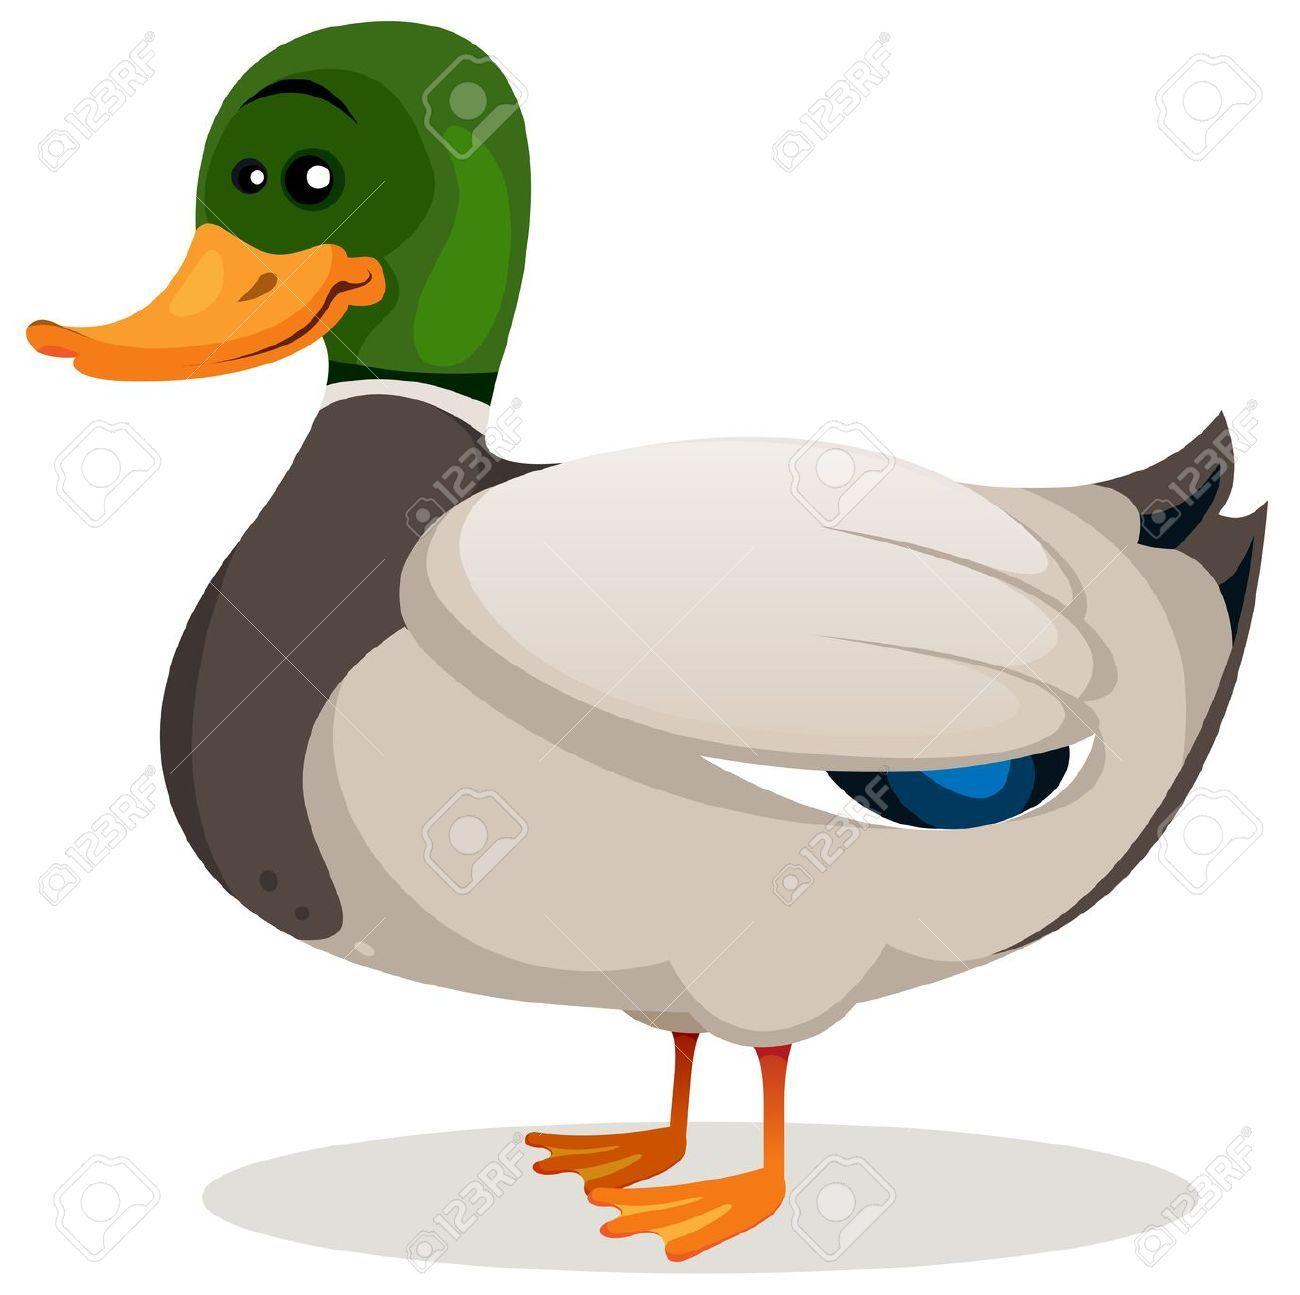 Resultado de imagen para pato animado | tareas | Pinterest | Searching